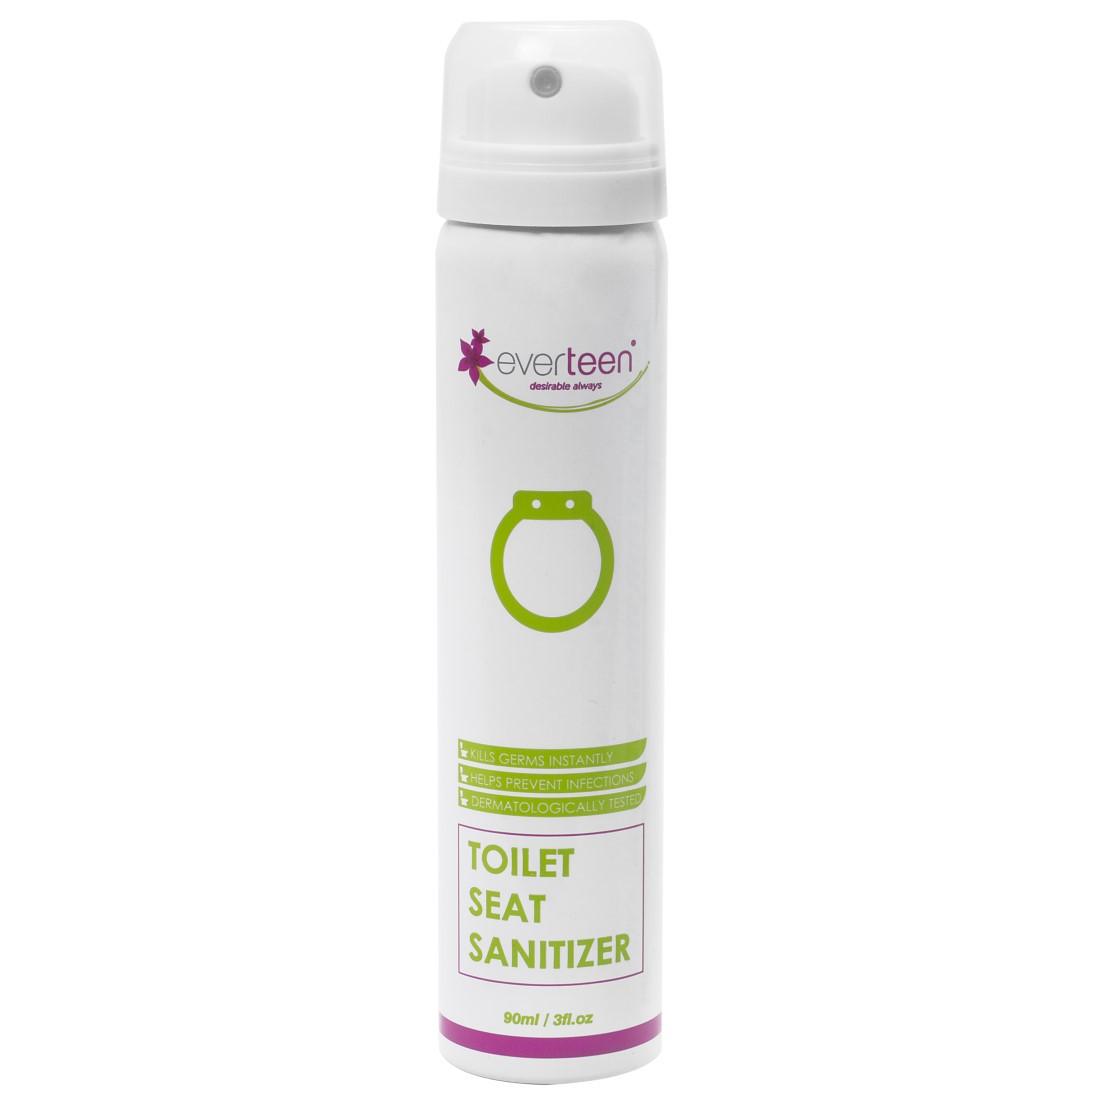 everteen® Instant Toilet Seat Sanitizer Spray for Women – 90ml